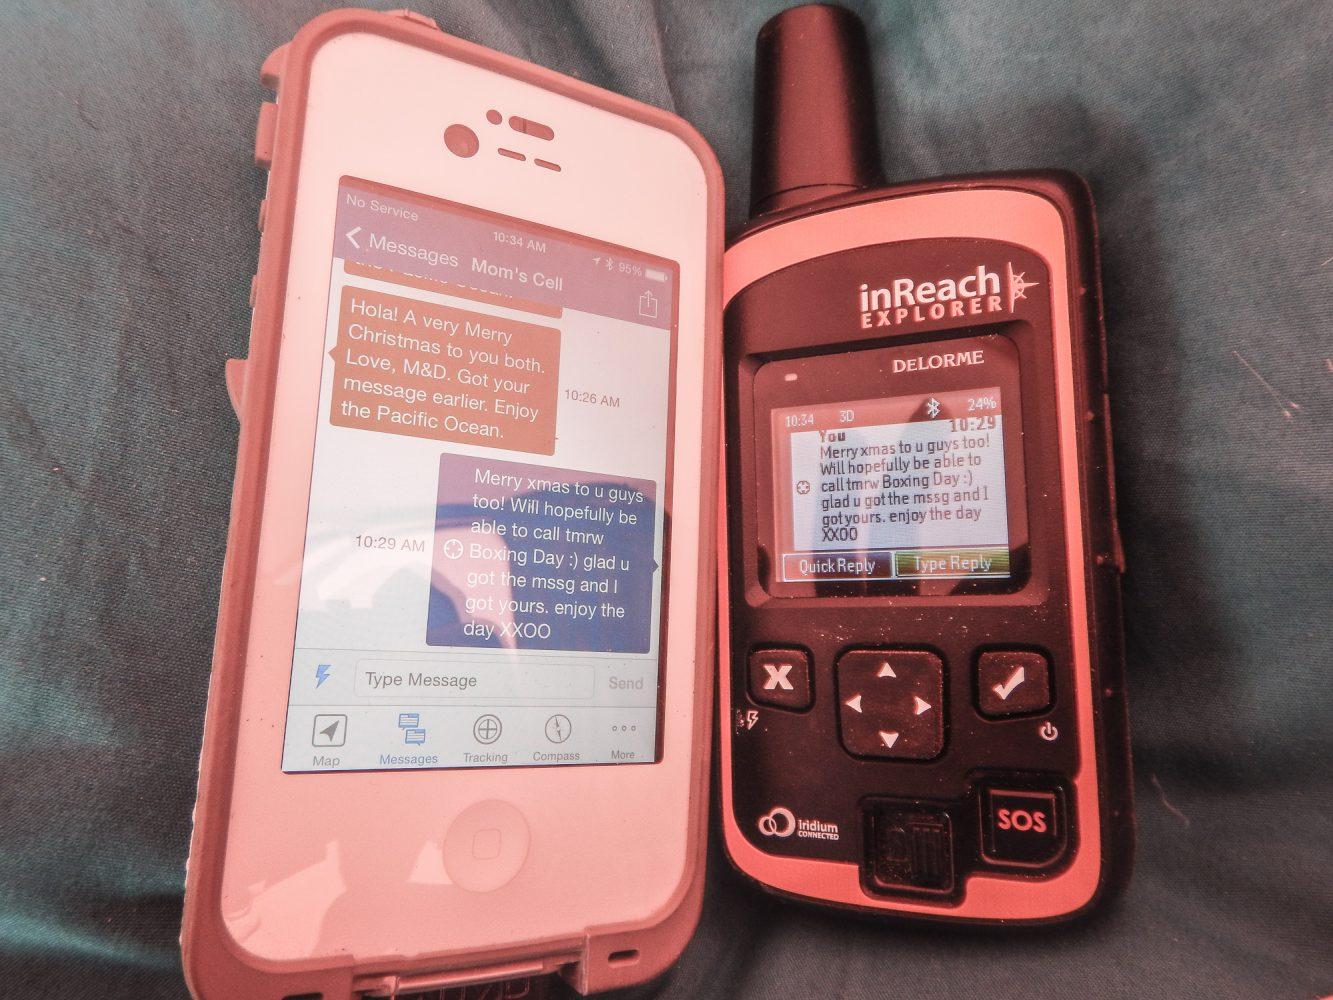 sending messages via the Earthmate App on a smartphone